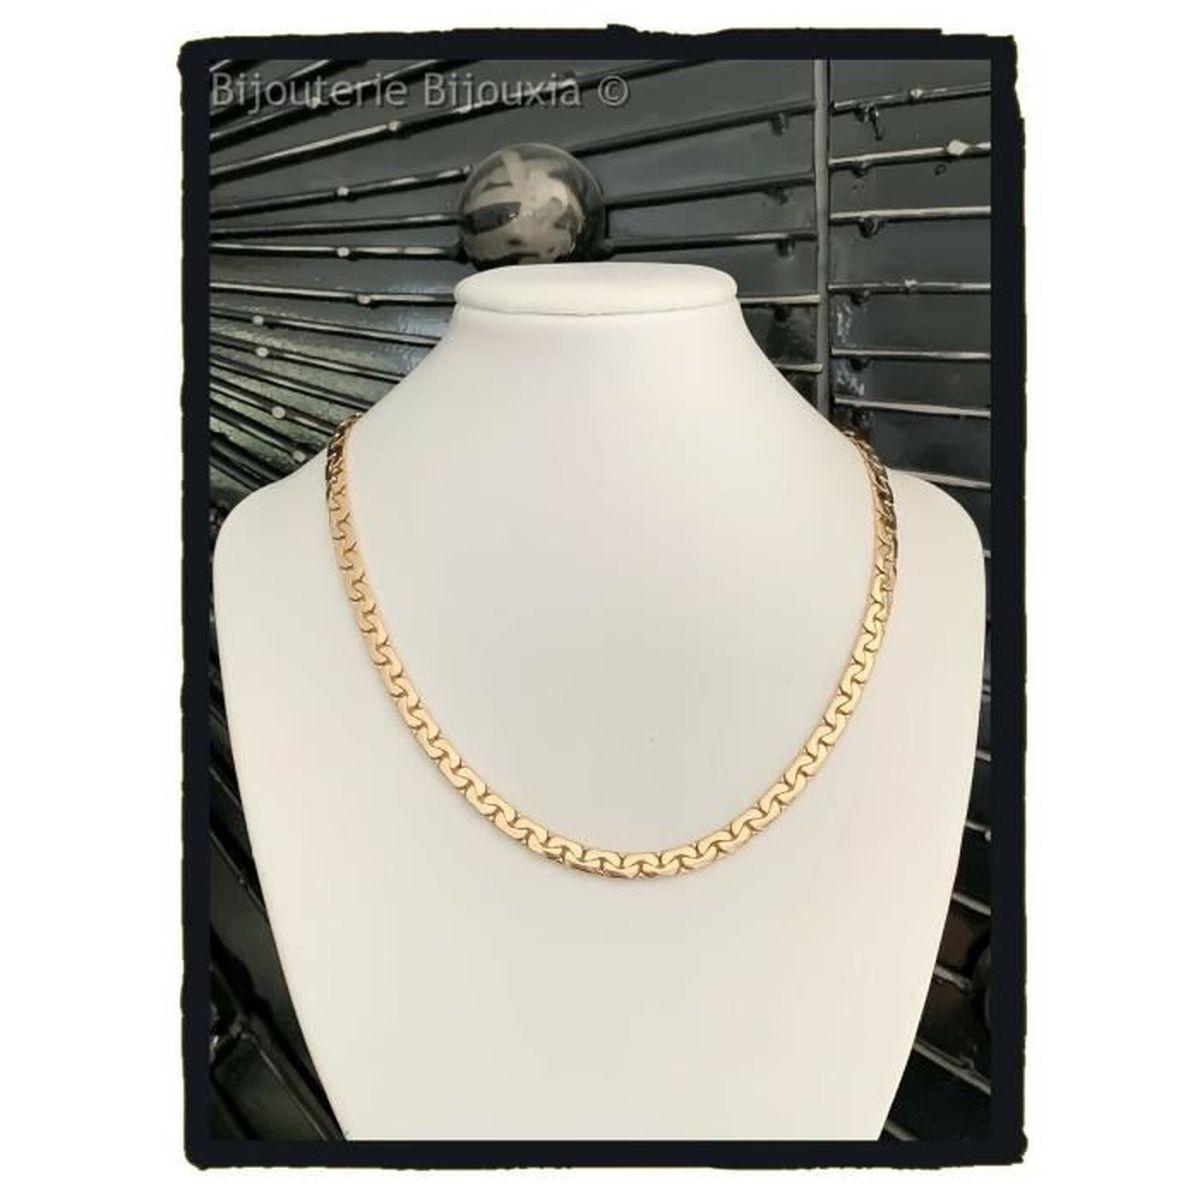 Collier Maille Haricot En Plaqué Or 18 carats 750//1000 NEUF Bijoux Femme